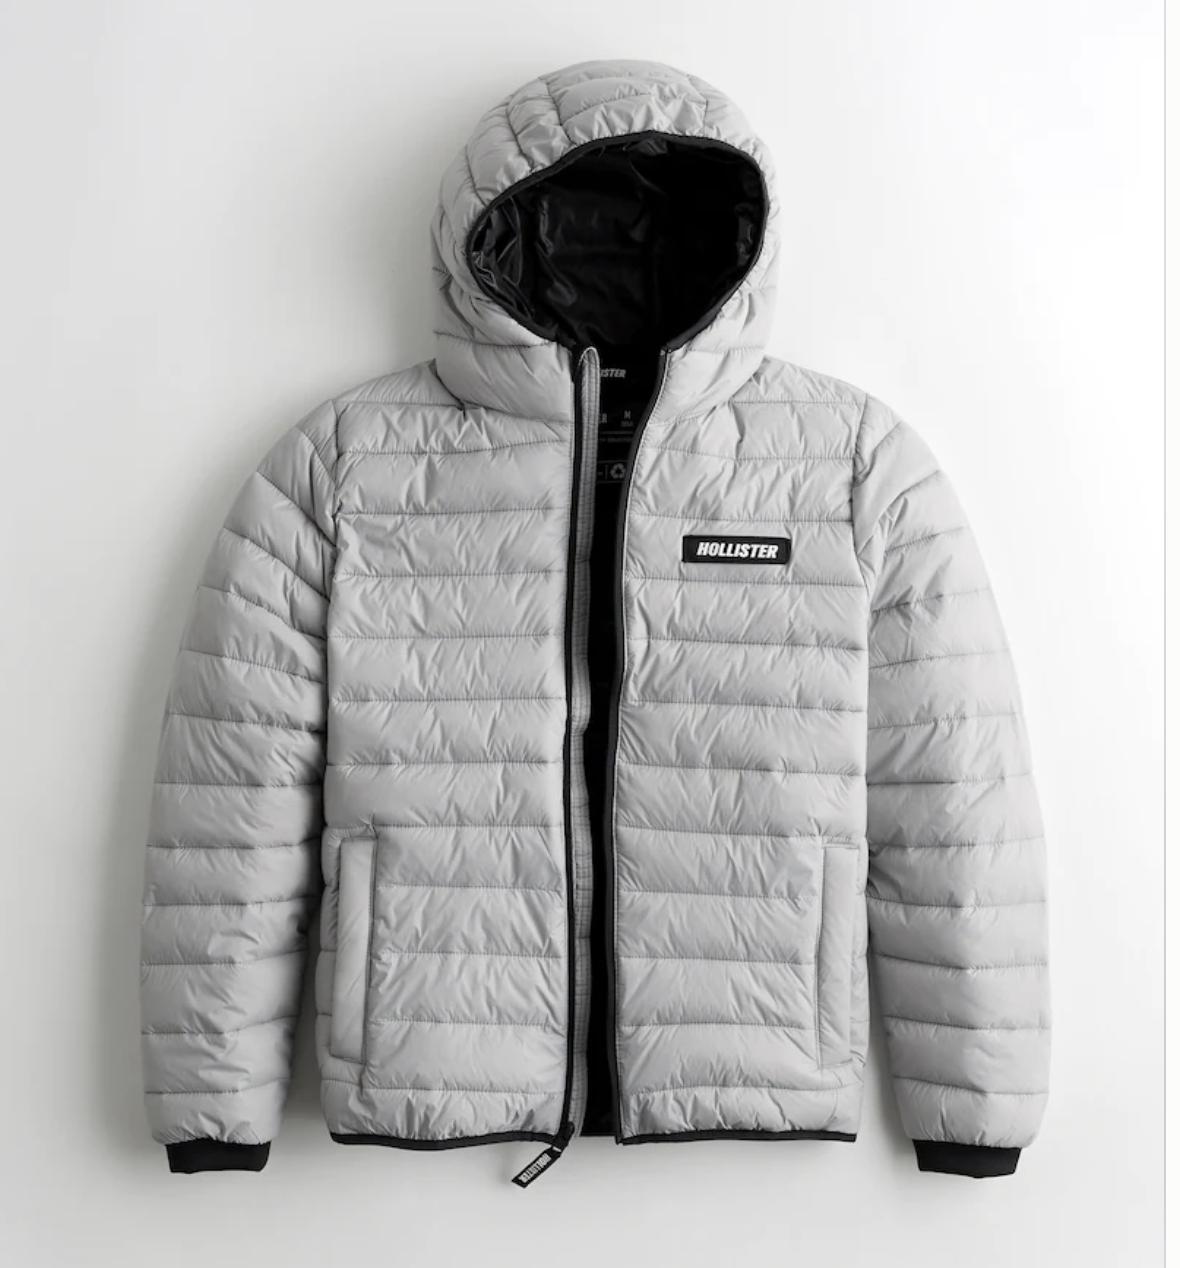 Preciazo chaqueta Hollister acolchada